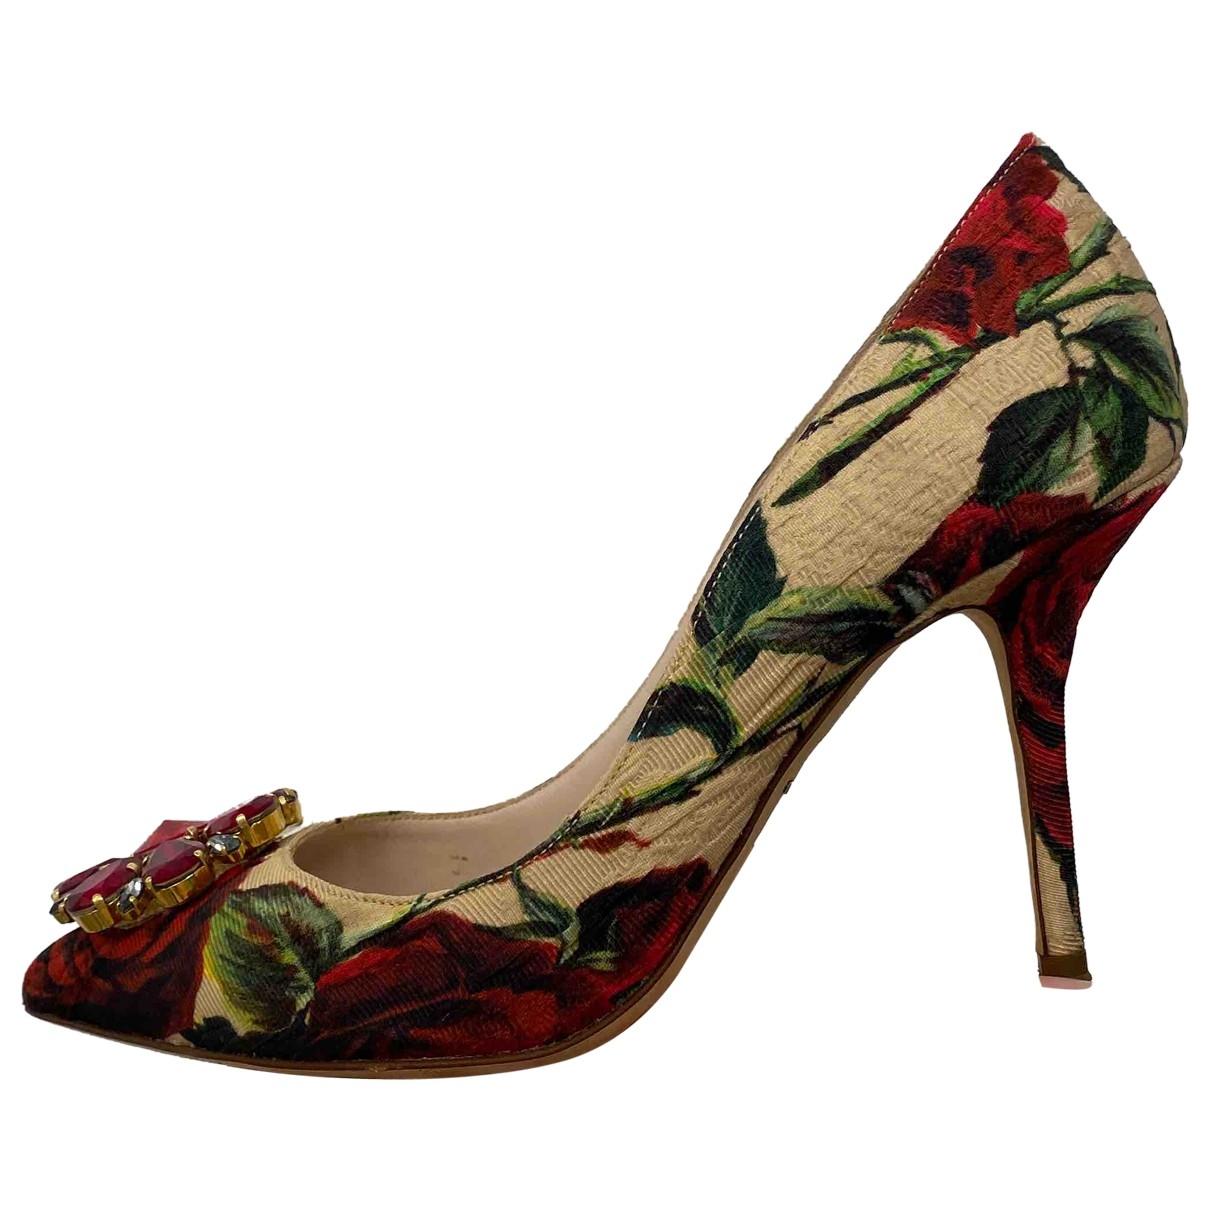 Tacones Taormina de Lona Dolce & Gabbana